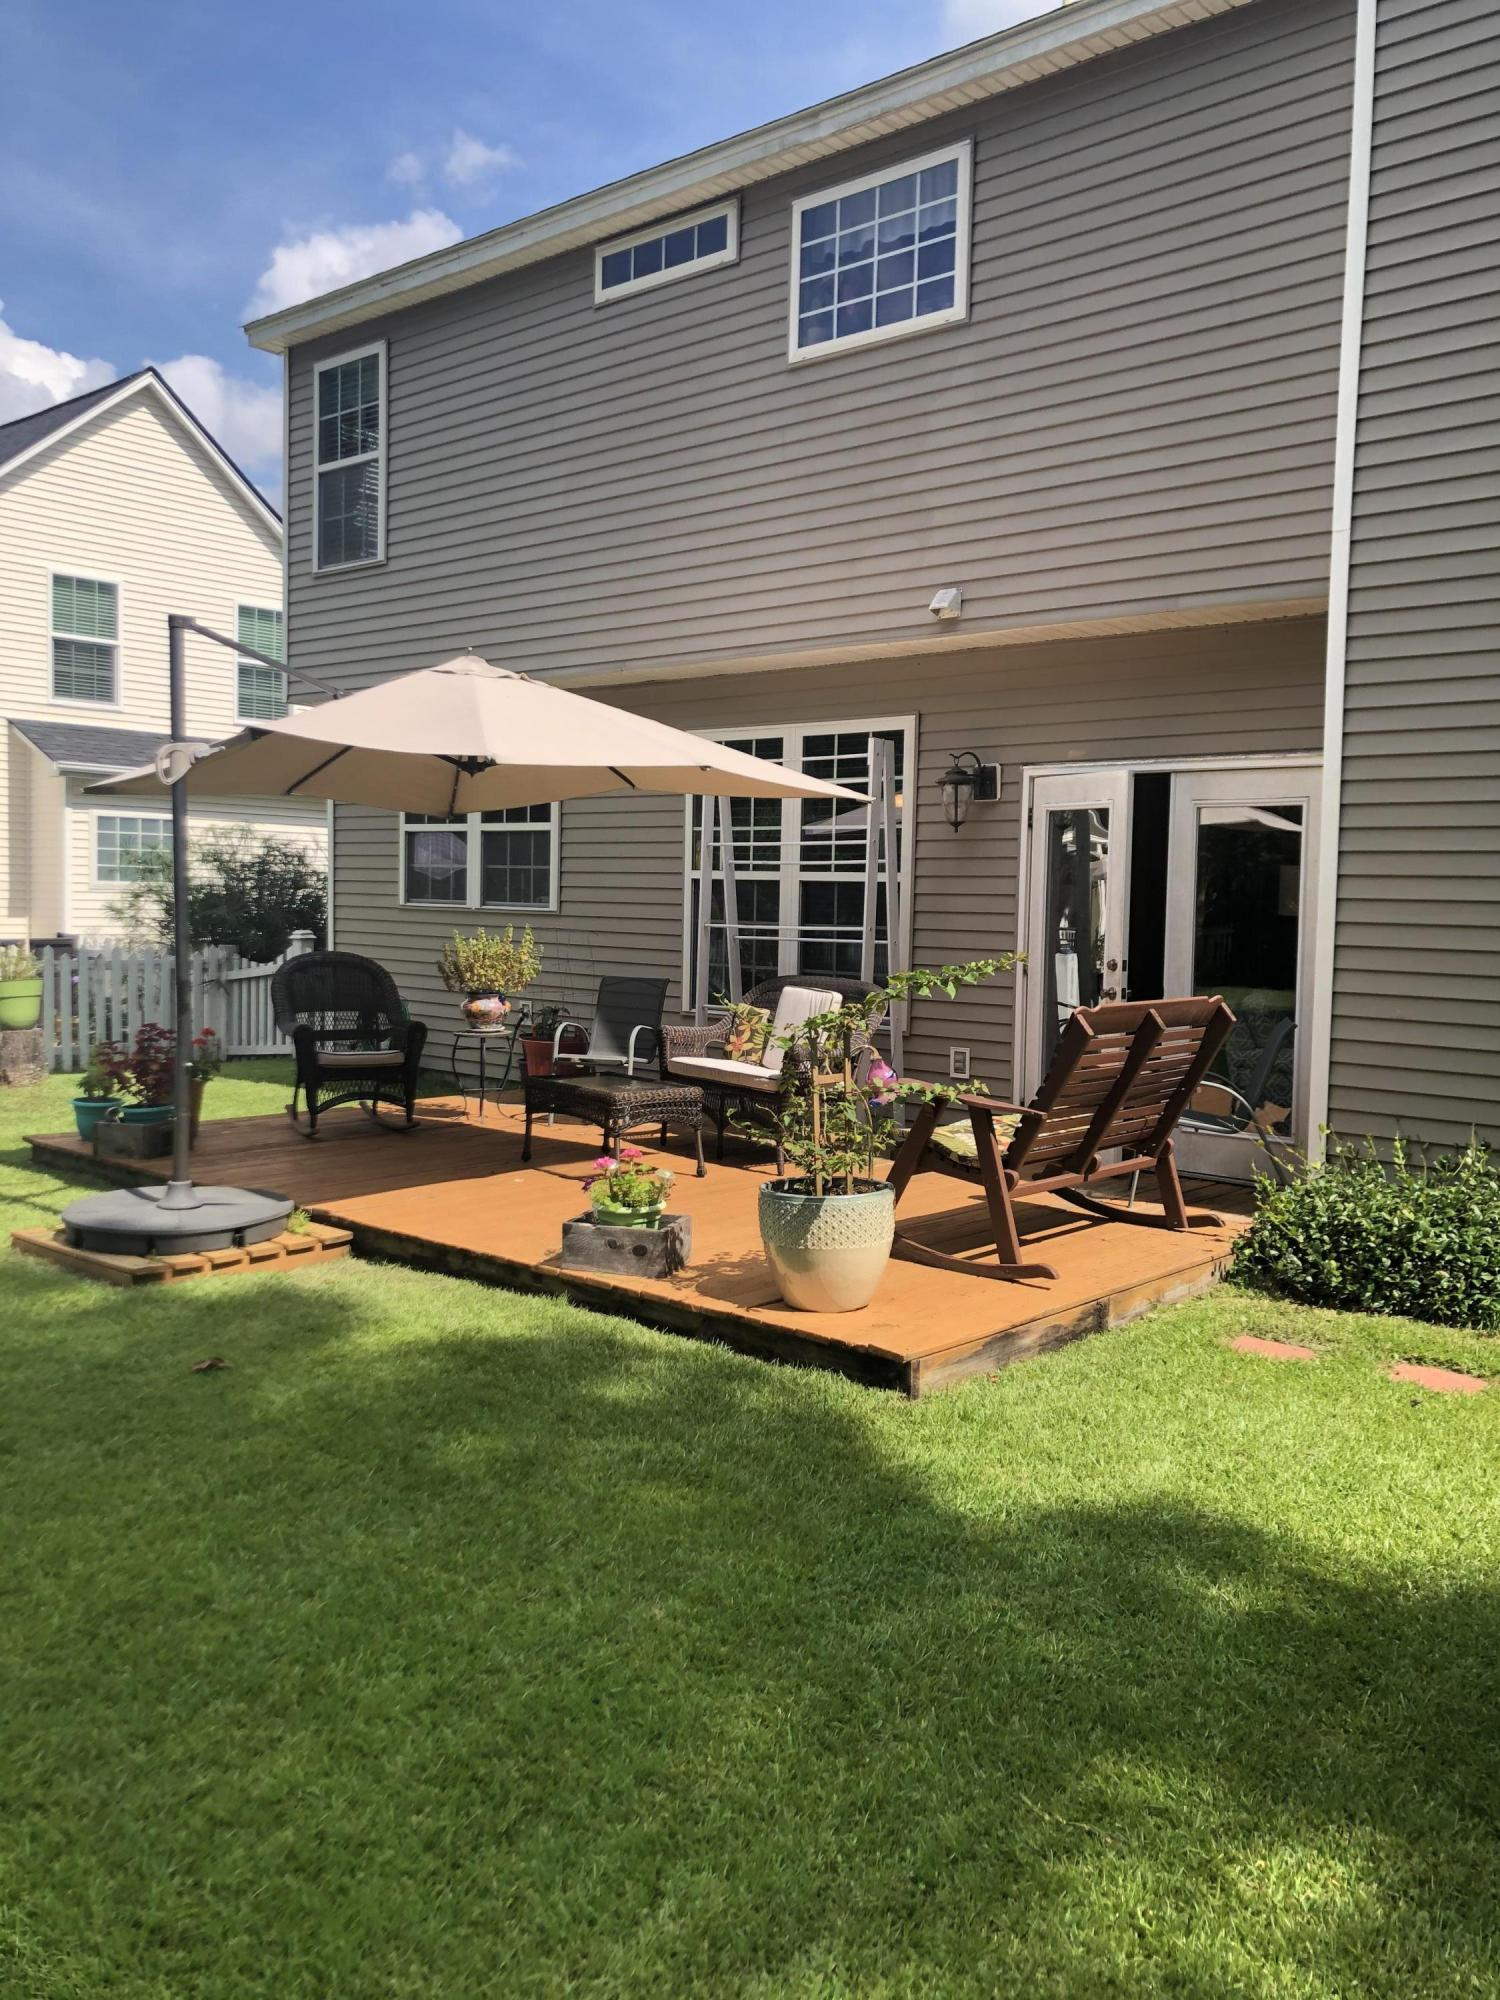 Dunes West Homes For Sale - 1500 Cypress Pointe, Mount Pleasant, SC - 21